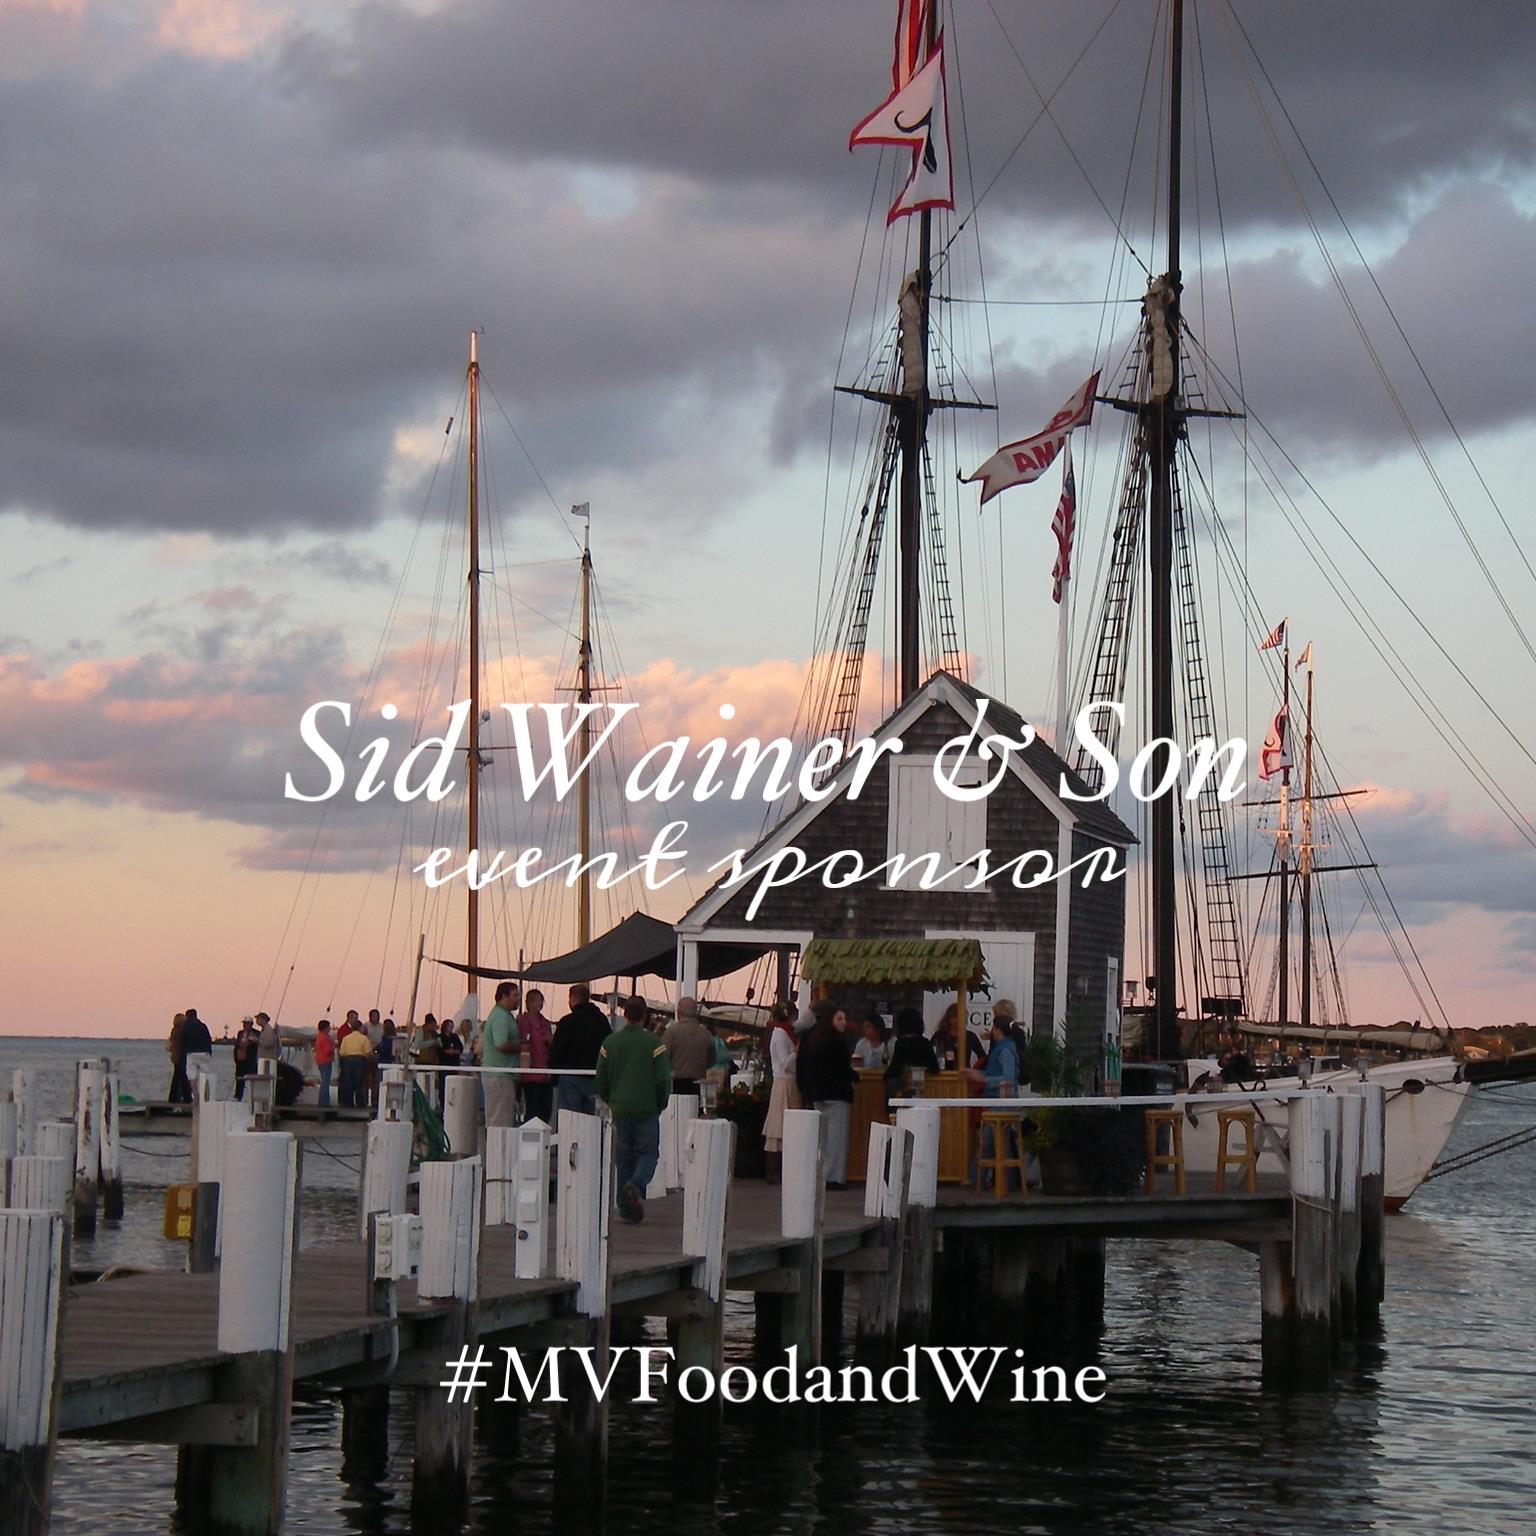 Sid Wainer & Son sponsors the Martha's Vineyard Food & Wine Festival